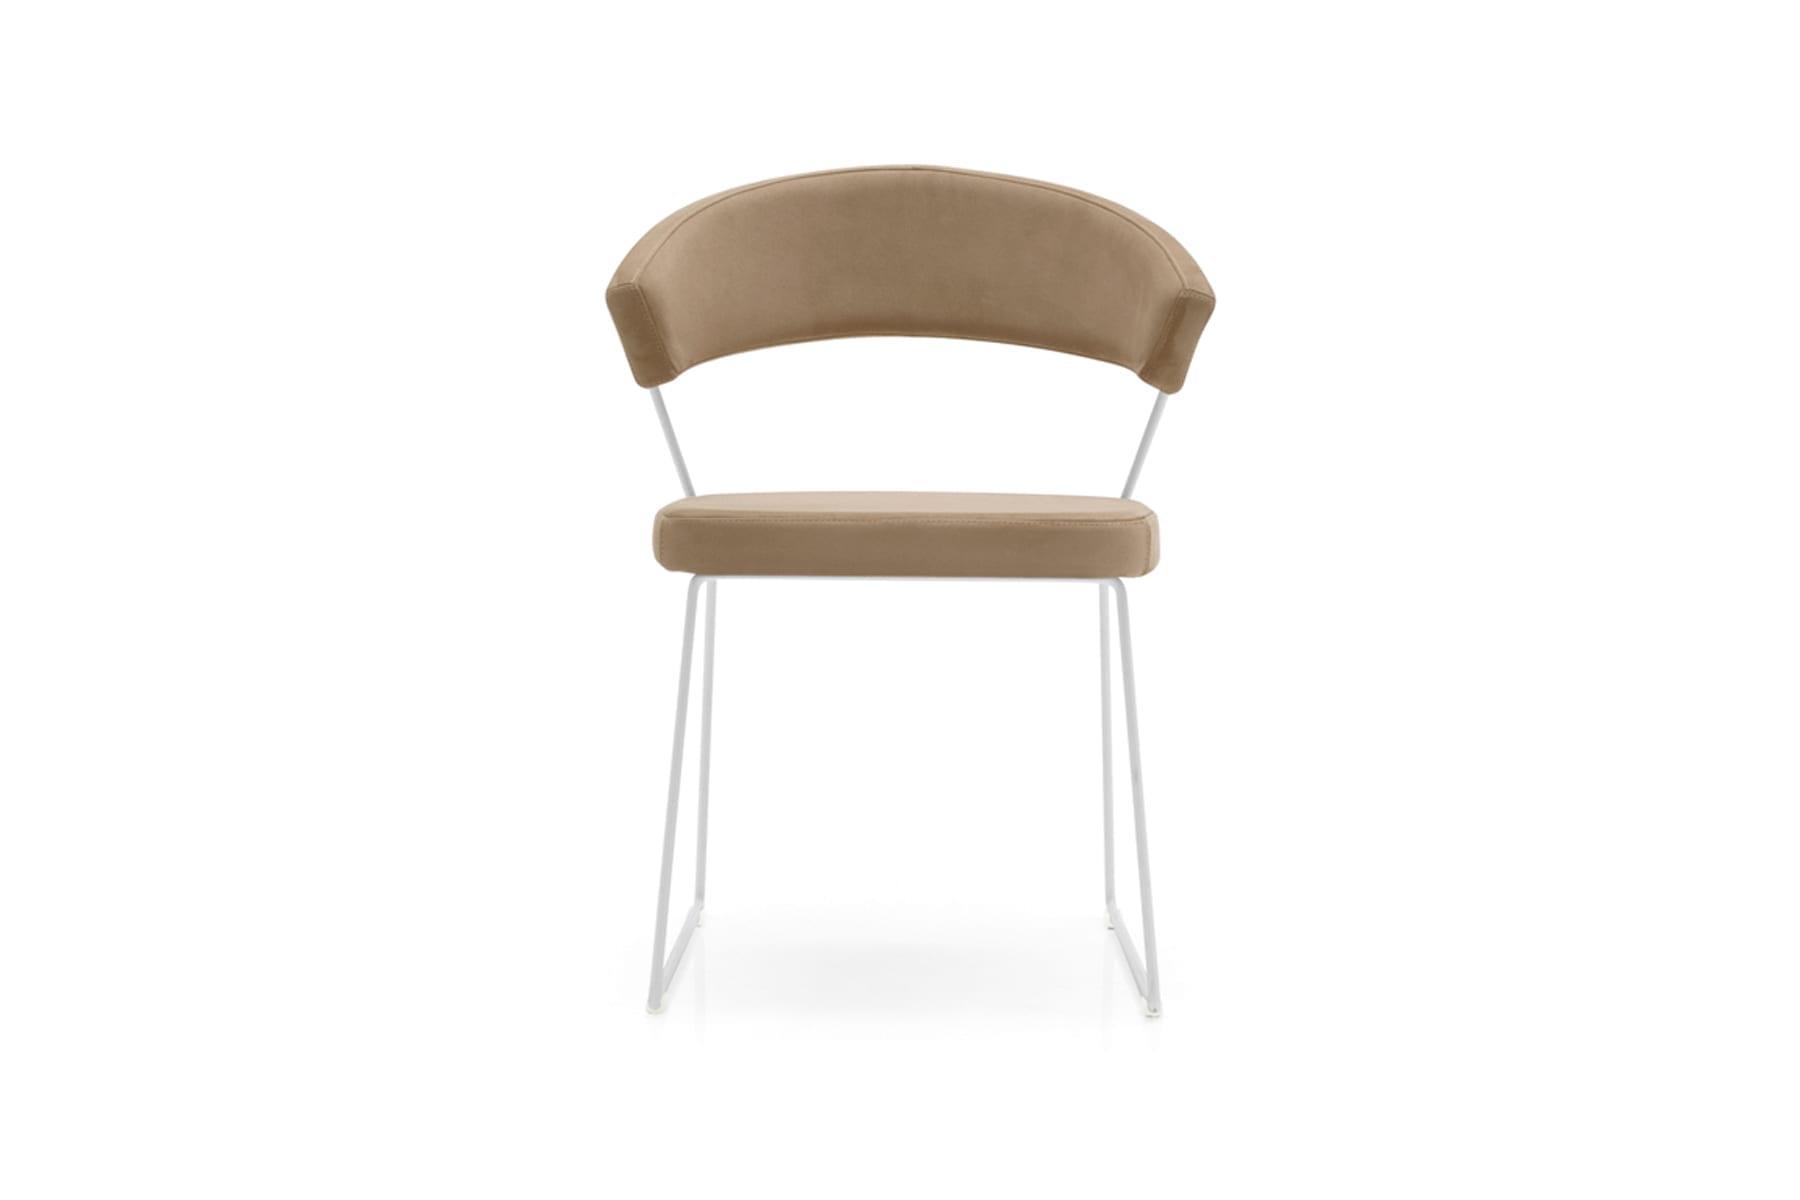 new york sofa bed nz jackson furniture 4347 belmont  calligaris dining chair mckenzie and willis